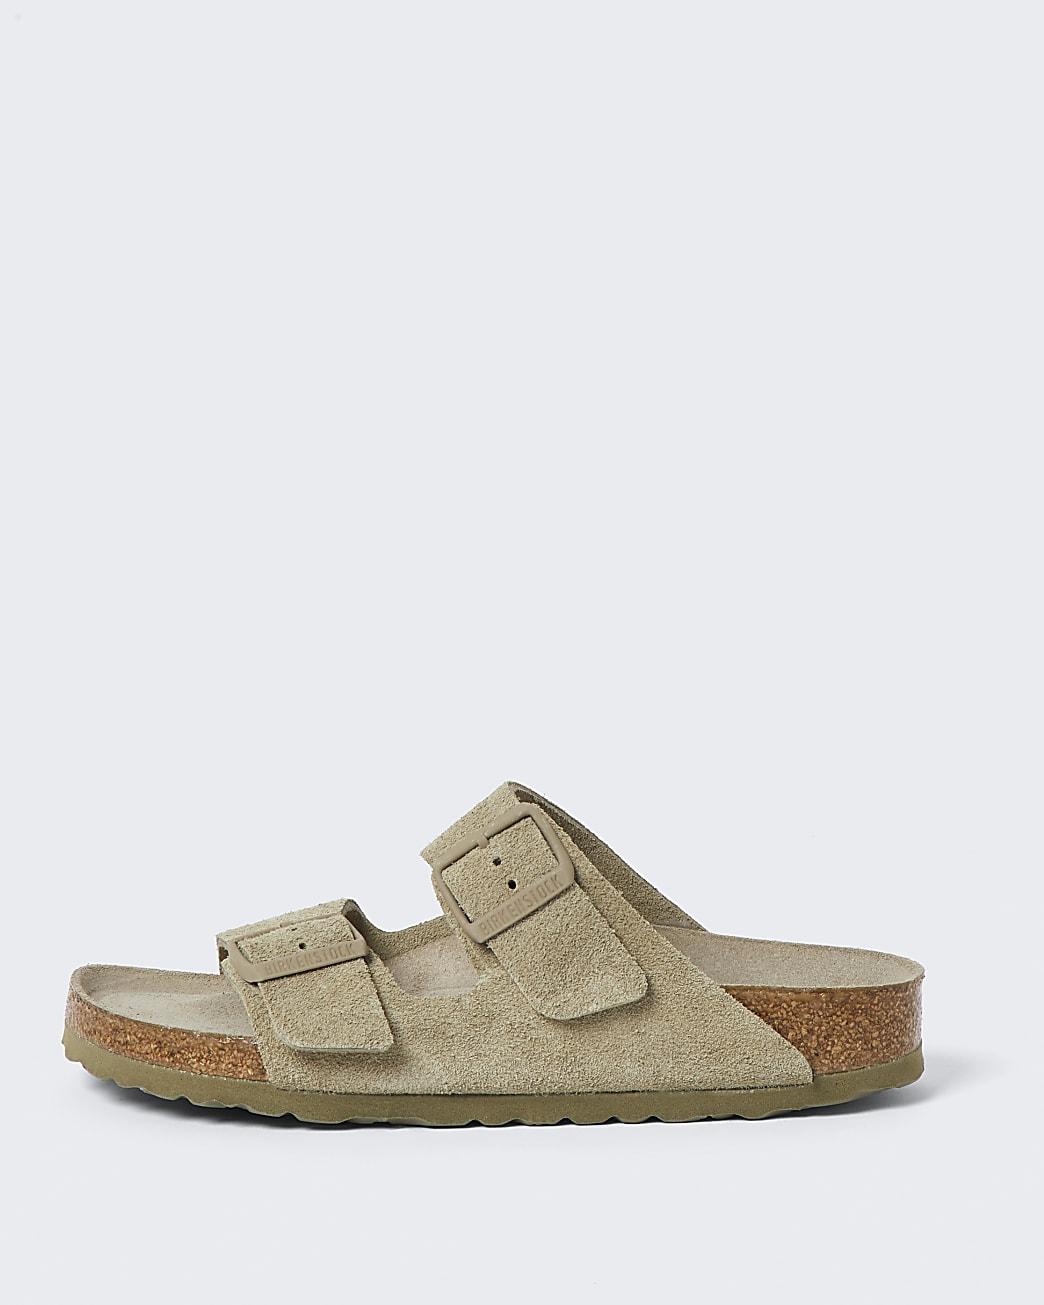 Birkenstock brown double strap sandal